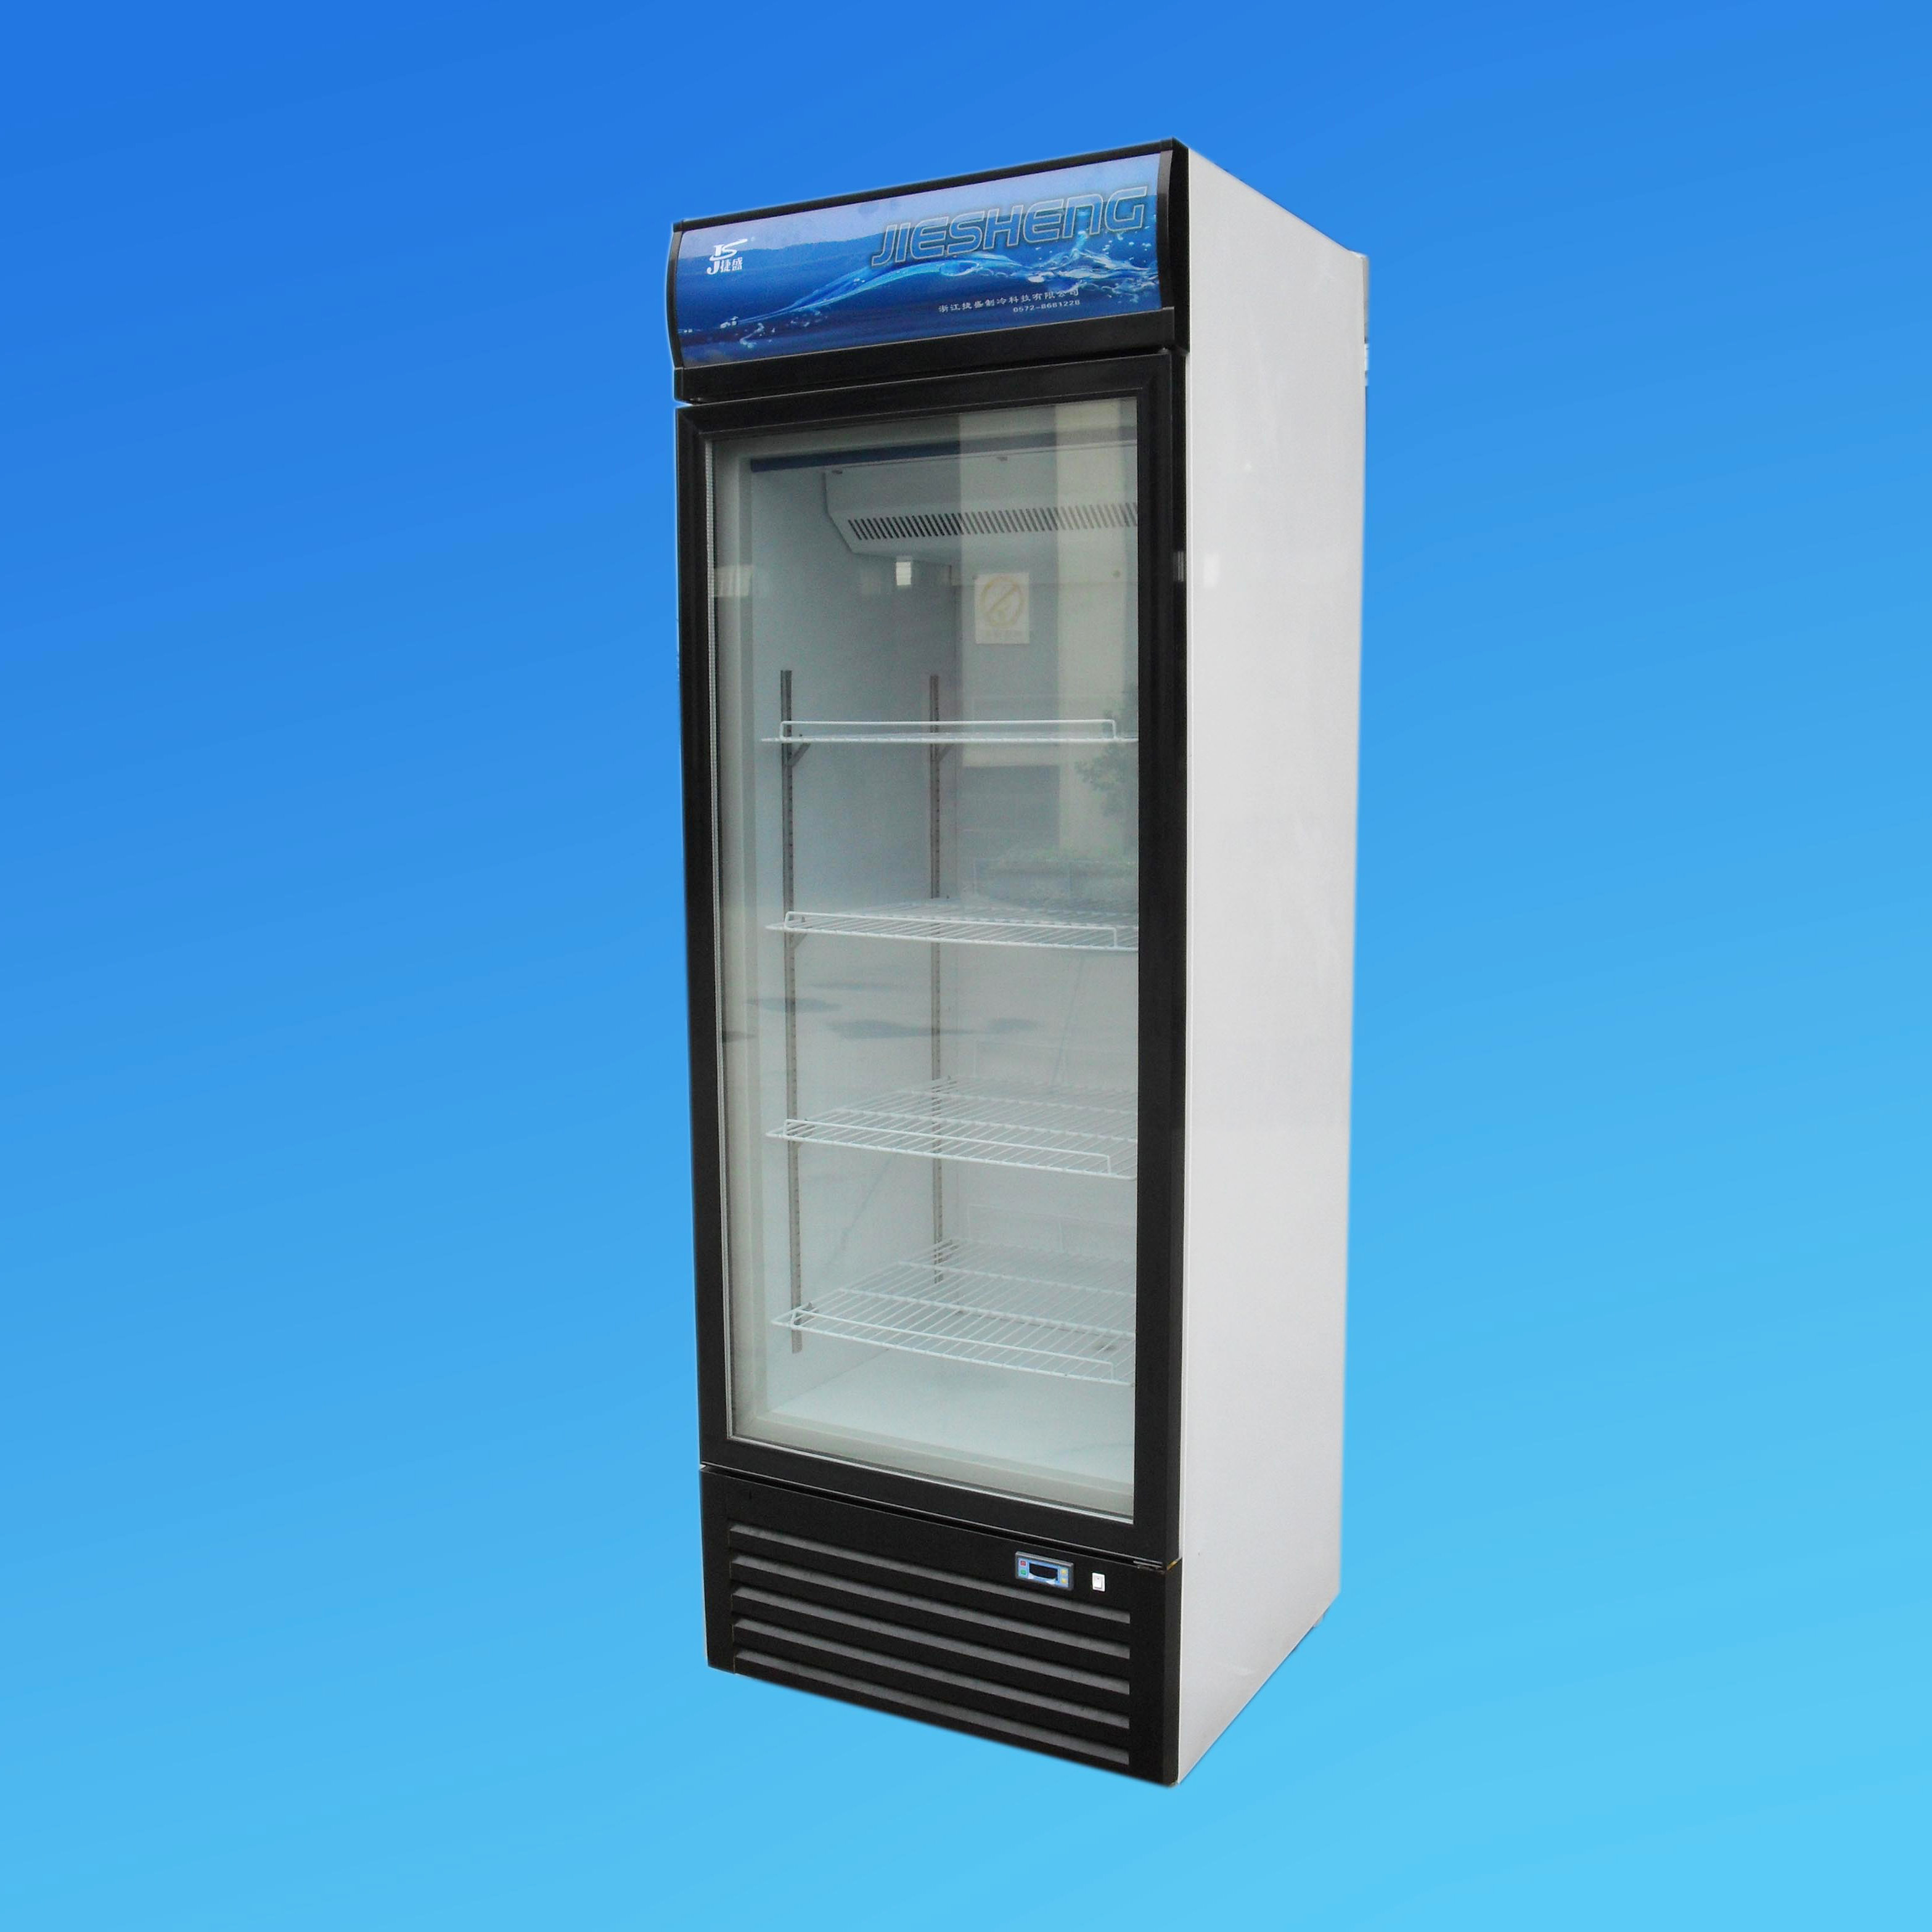 Upright Freezer, Display Freezer, Ice Cream Freezer LSD-368